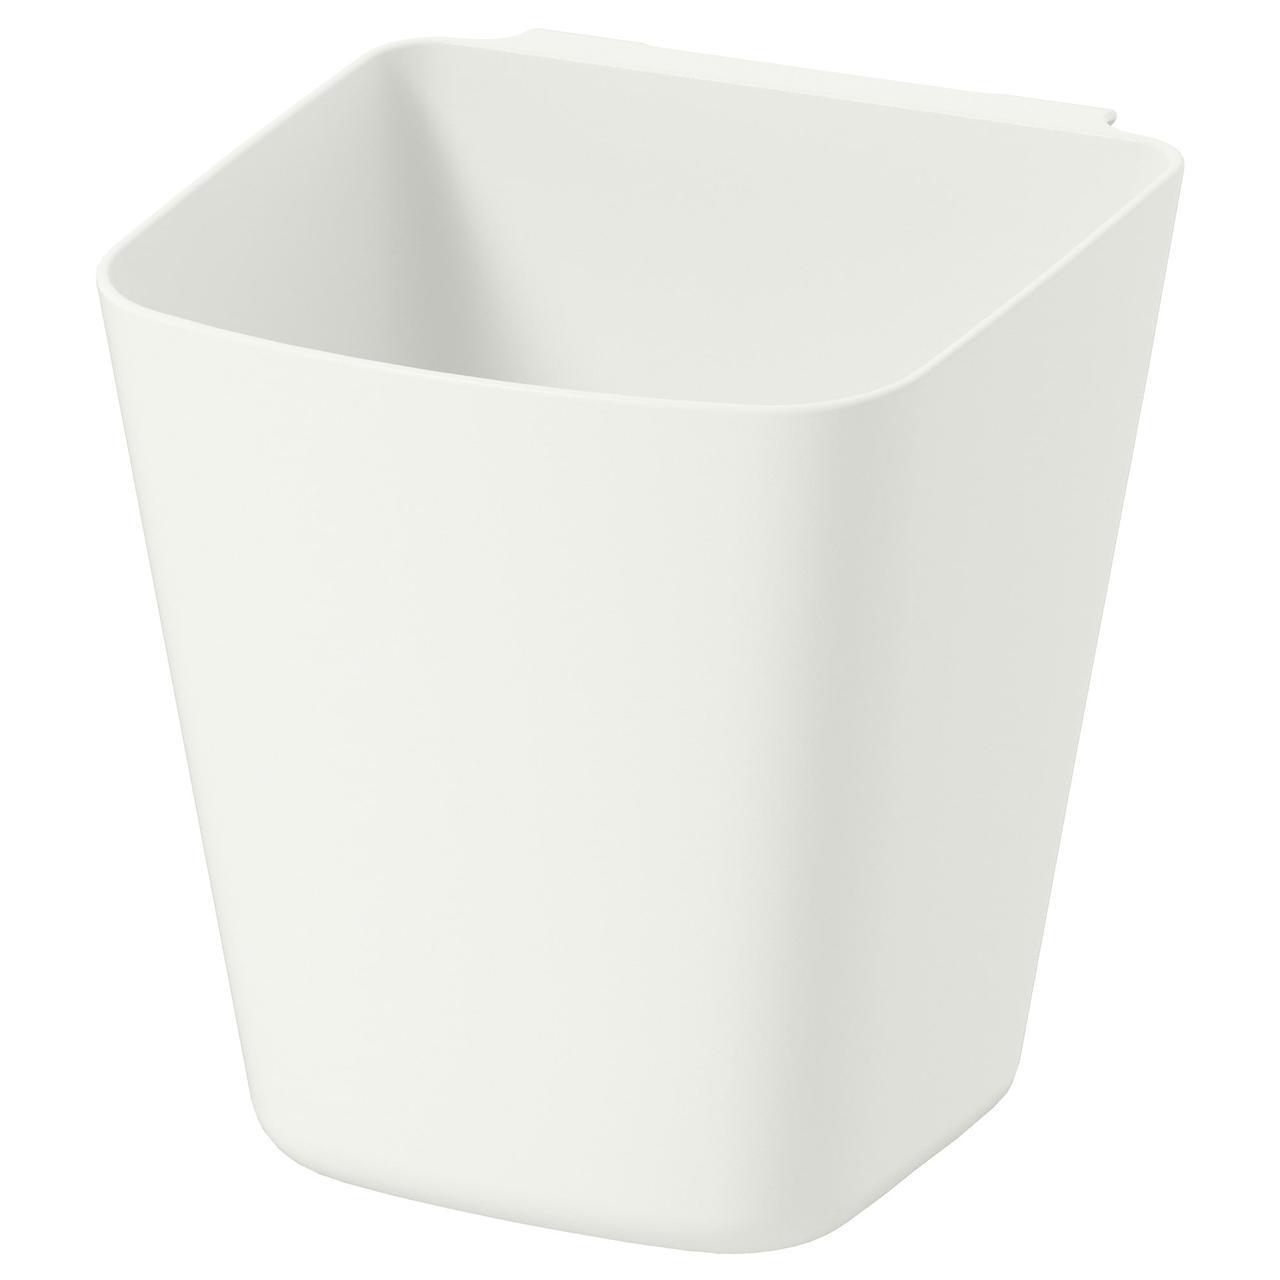 IKEA SUNNERSTA (503.037.35) Контейнер 12x11 см